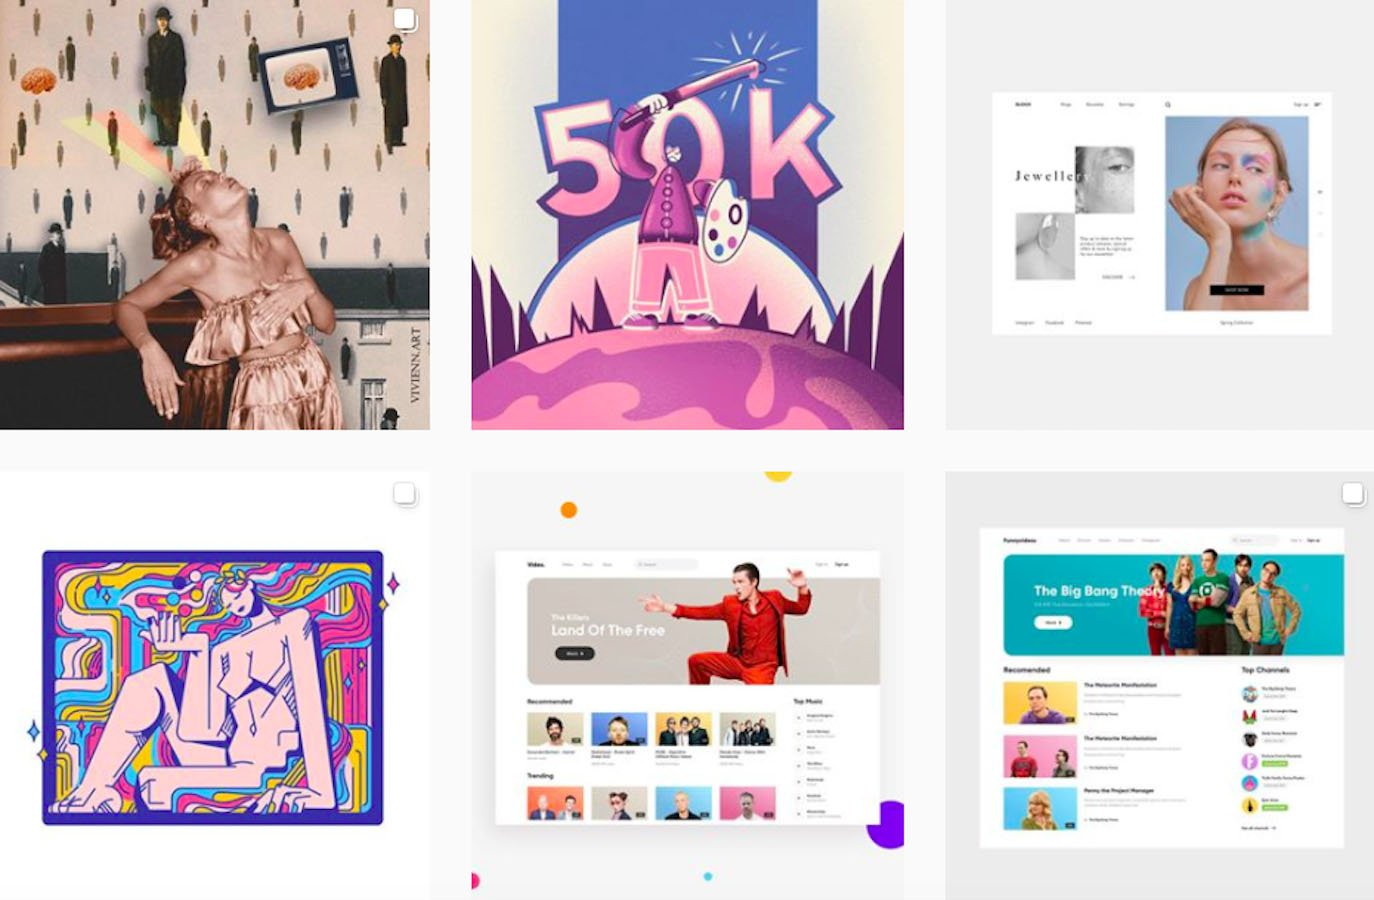 Web Design Inspiration: 110+ Accounts On Instagram and 10+ Best UX & Web Design Books in 2020 - gtamarashvili